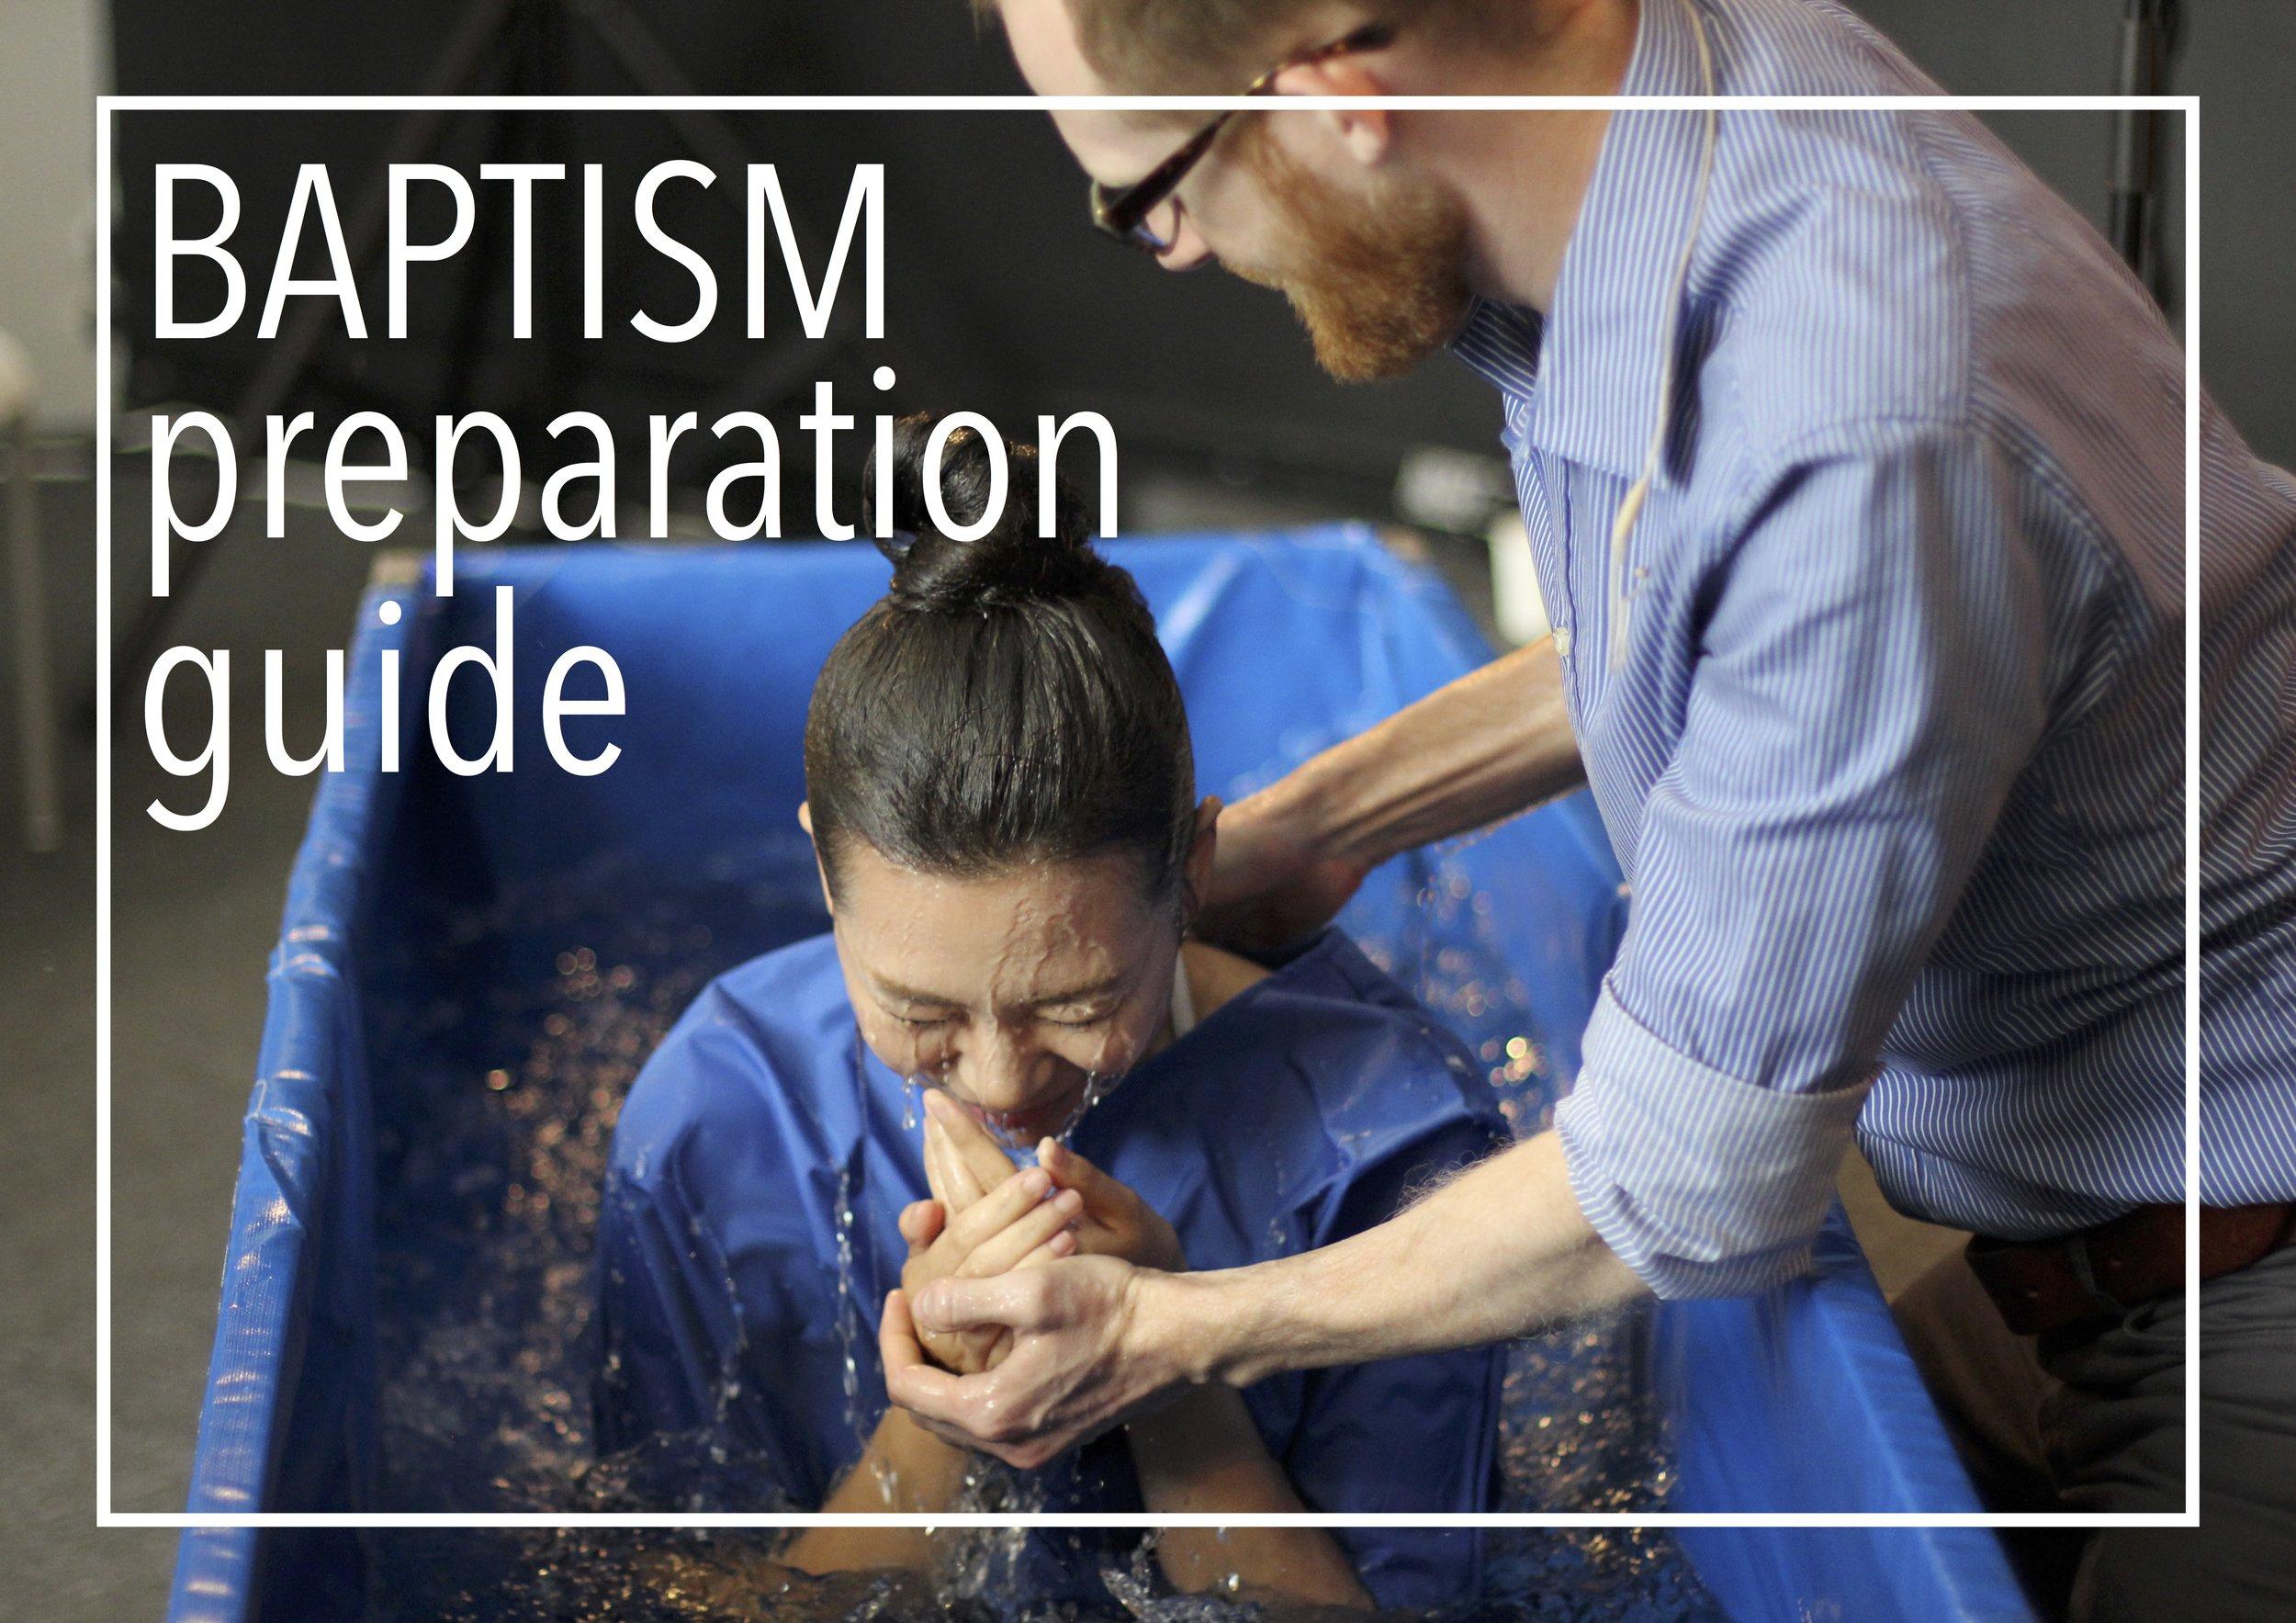 baptism guide pic jpeg.jpg